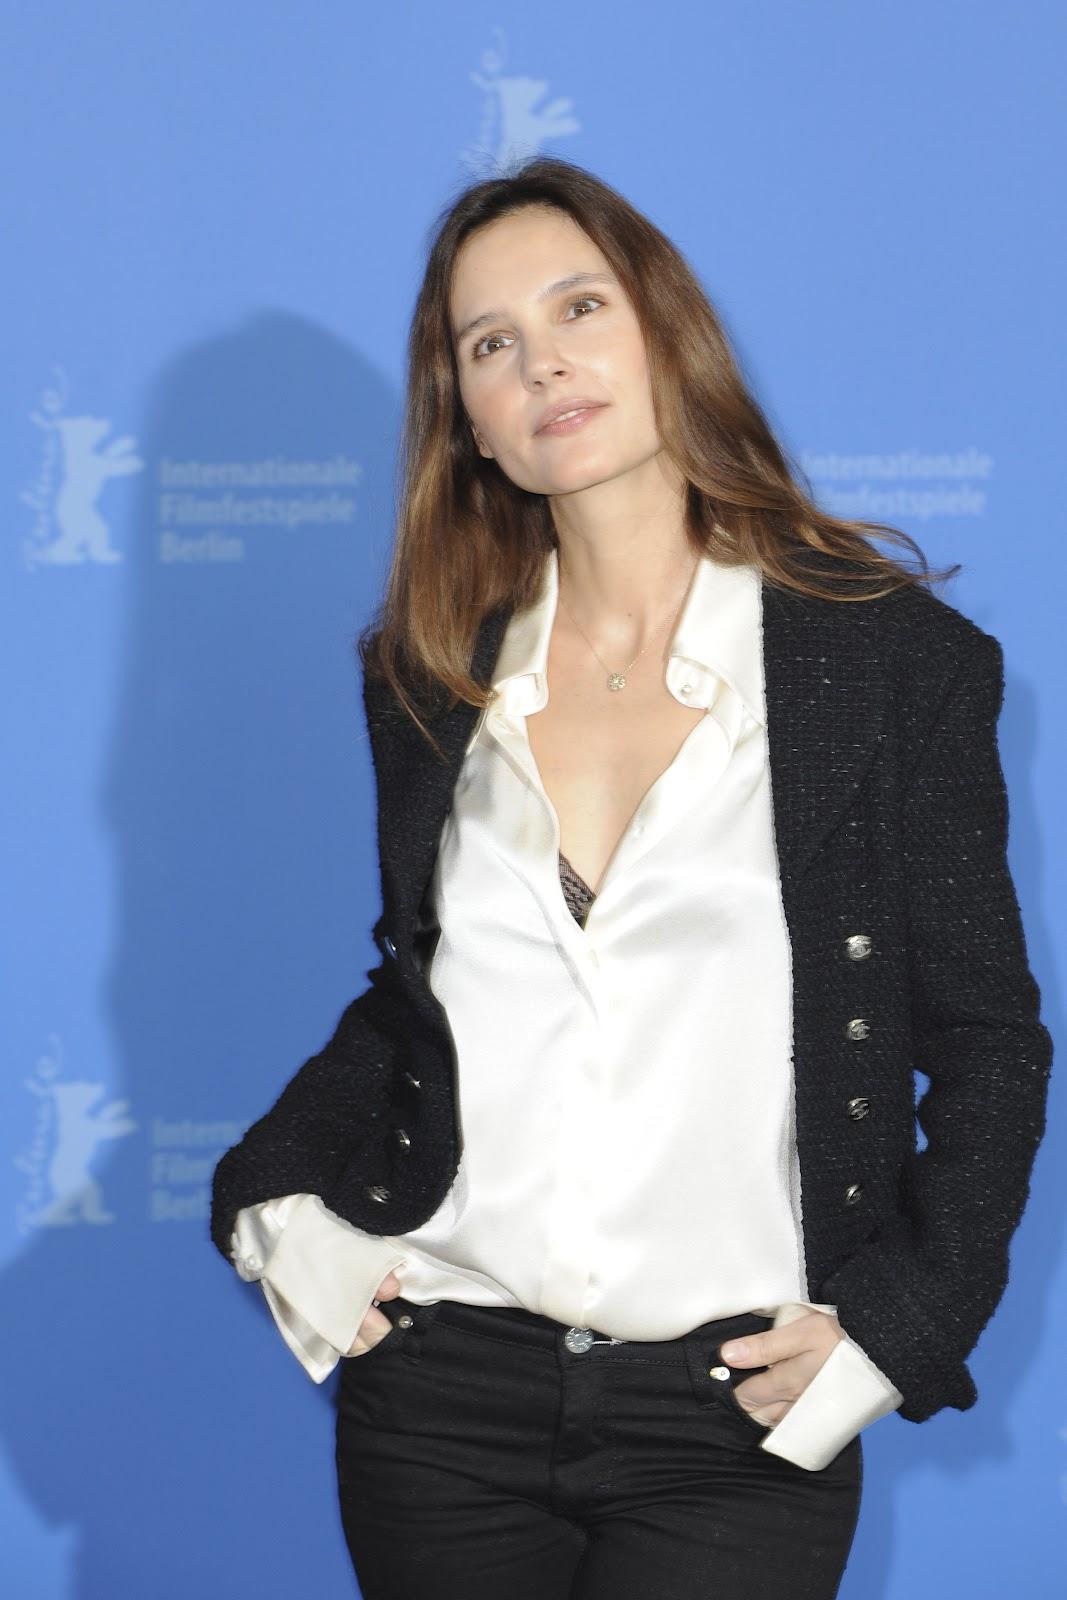 Cleavage Virginie Ledoyen nudes (63 photo), Sexy, Hot, Selfie, lingerie 2020